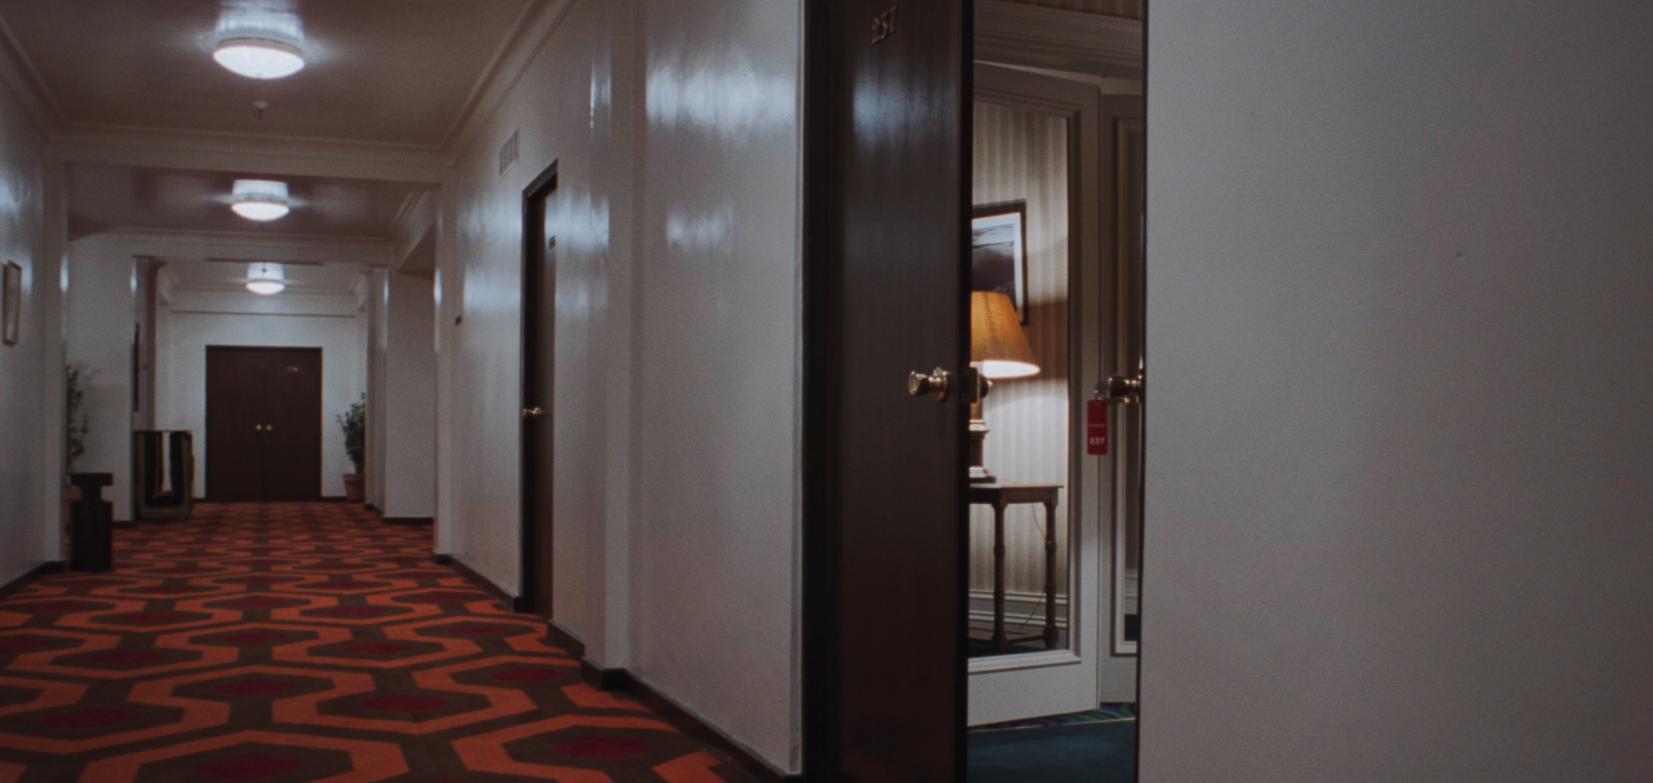 Room 237 The Shining Lia Beldam Interview